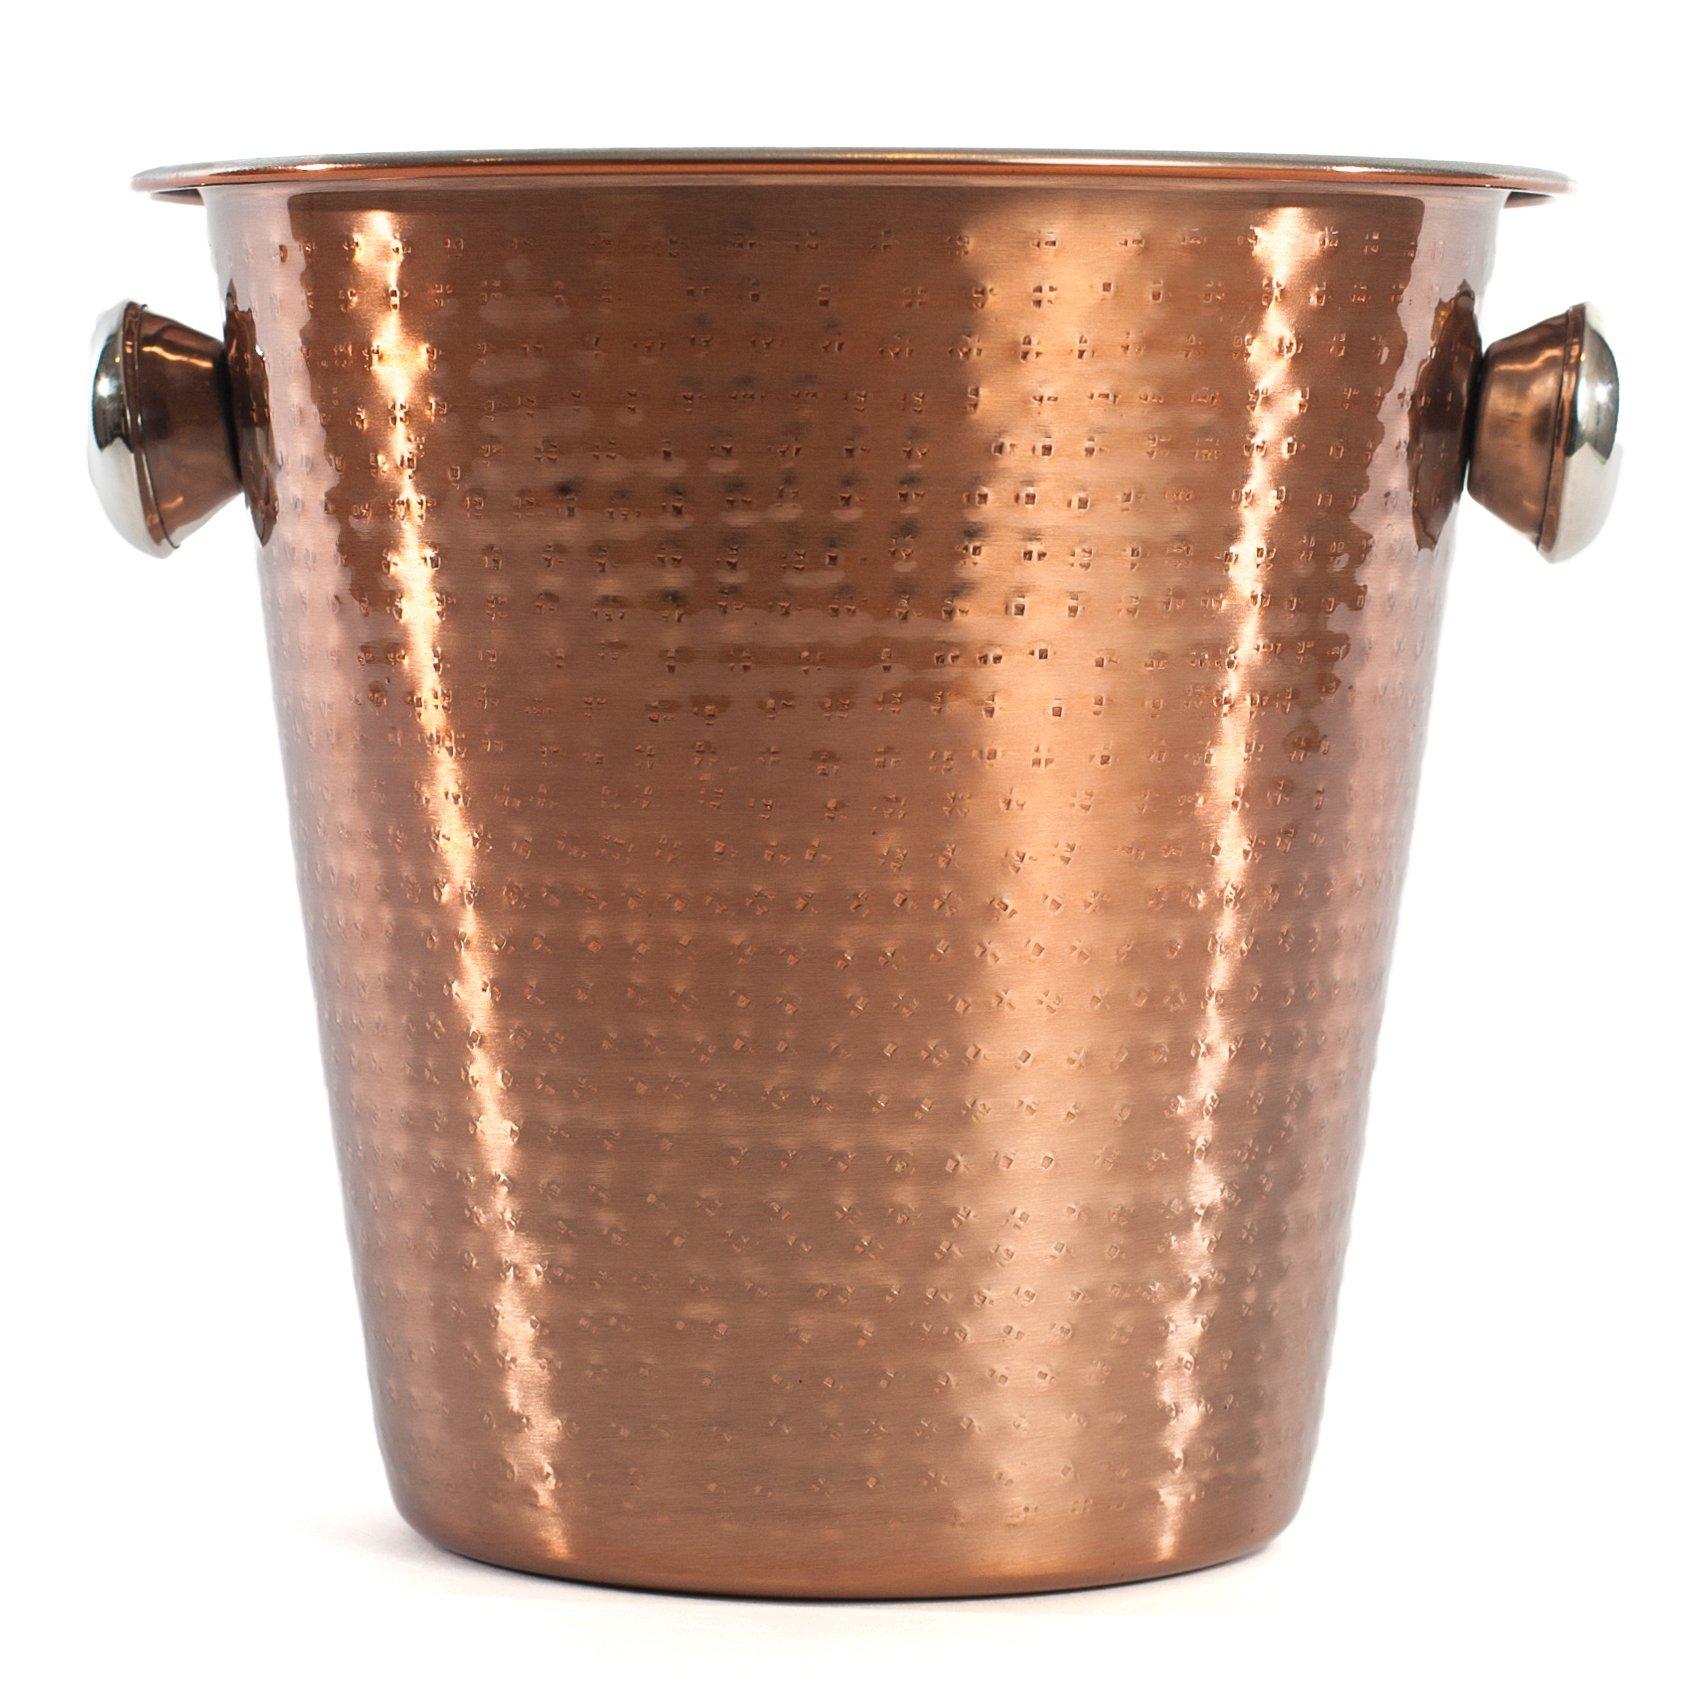 Bel-Air 6000 Champagne Bucket, Copper